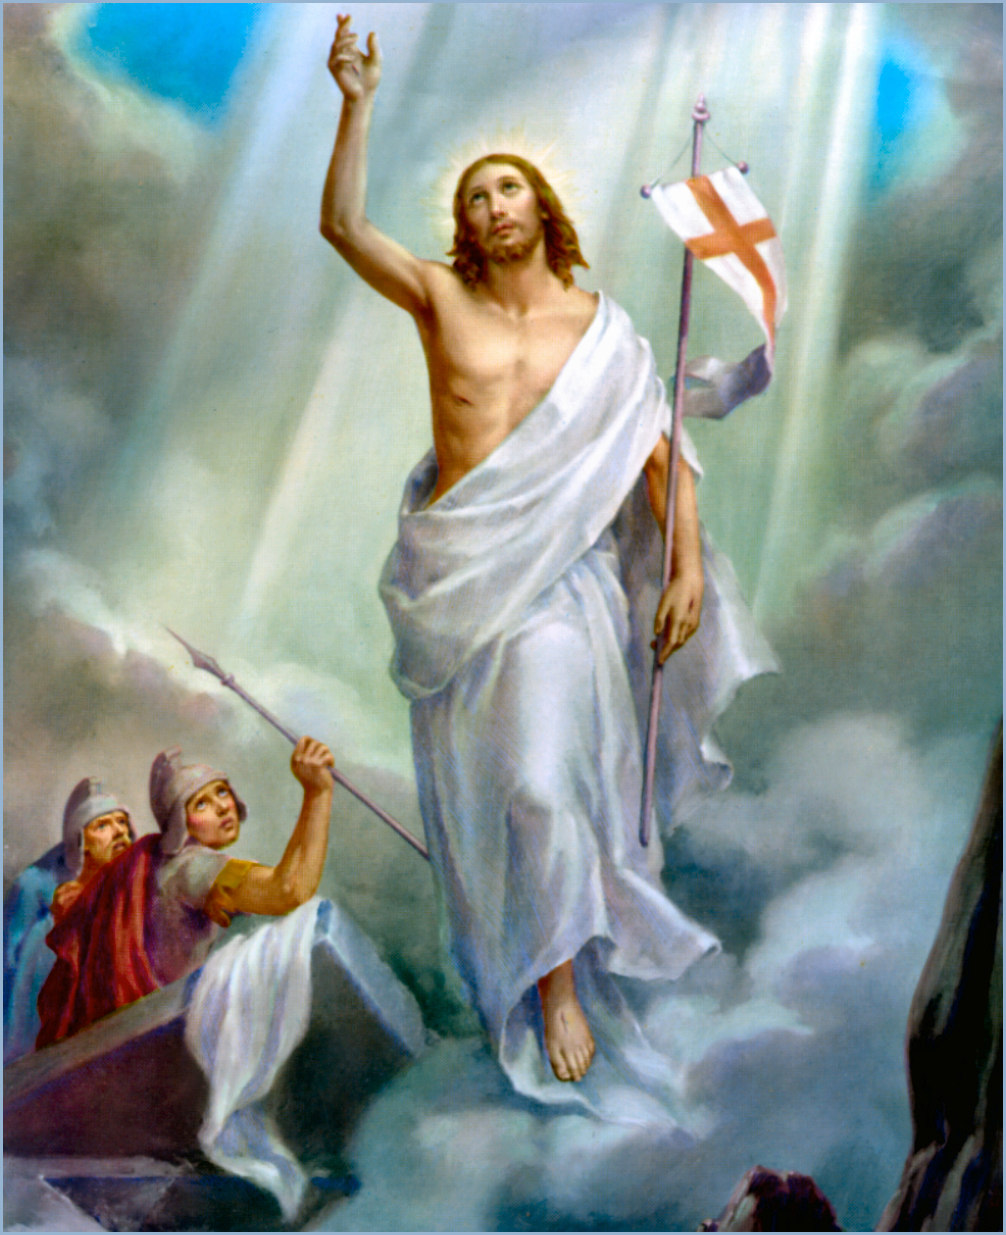 Christ Is Risen! Hallelujah!